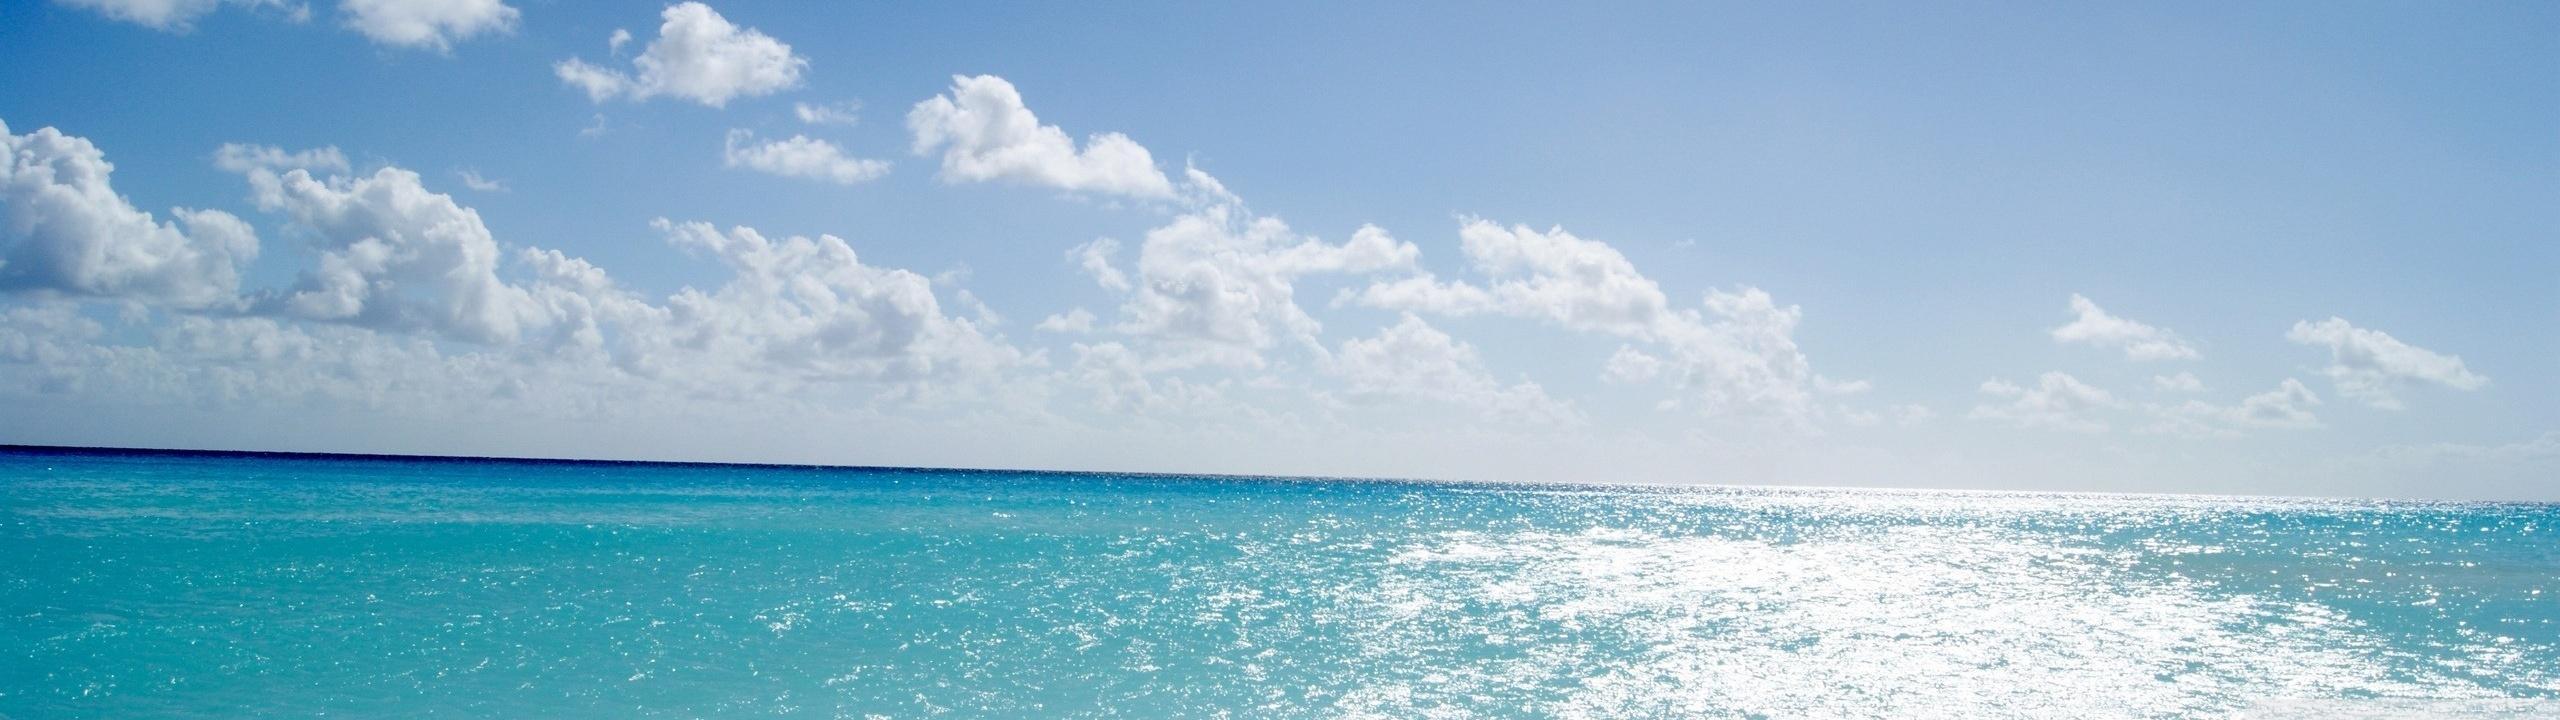 3840 X 1080 Beach Wallpapers - Top Free 3840 X 1080 Beach ...